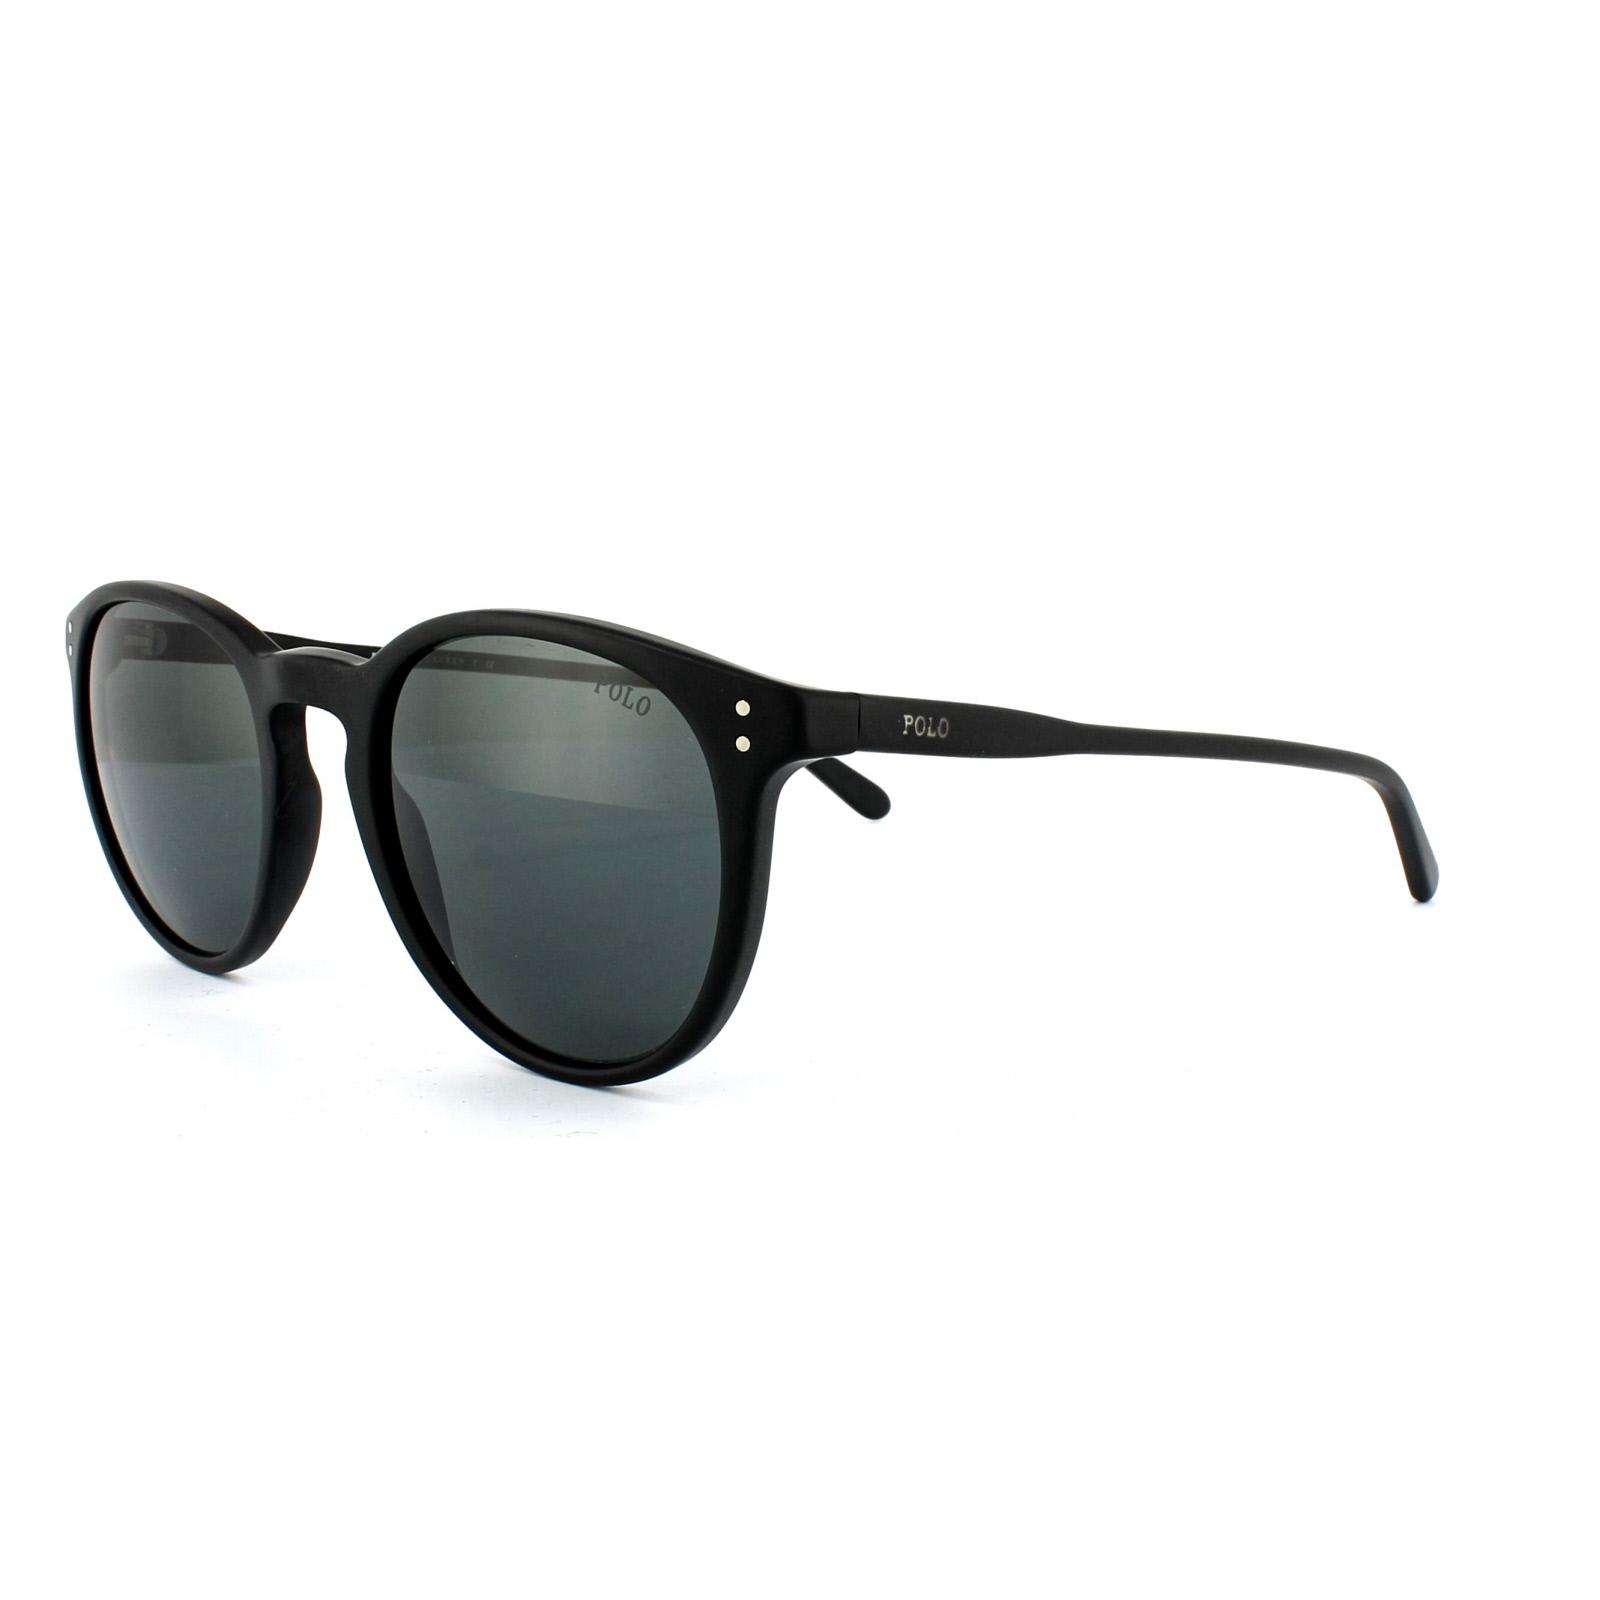 019cb150c Cheap Polo Ralph Lauren 4110 Sunglasses - Discounted Sunglasses